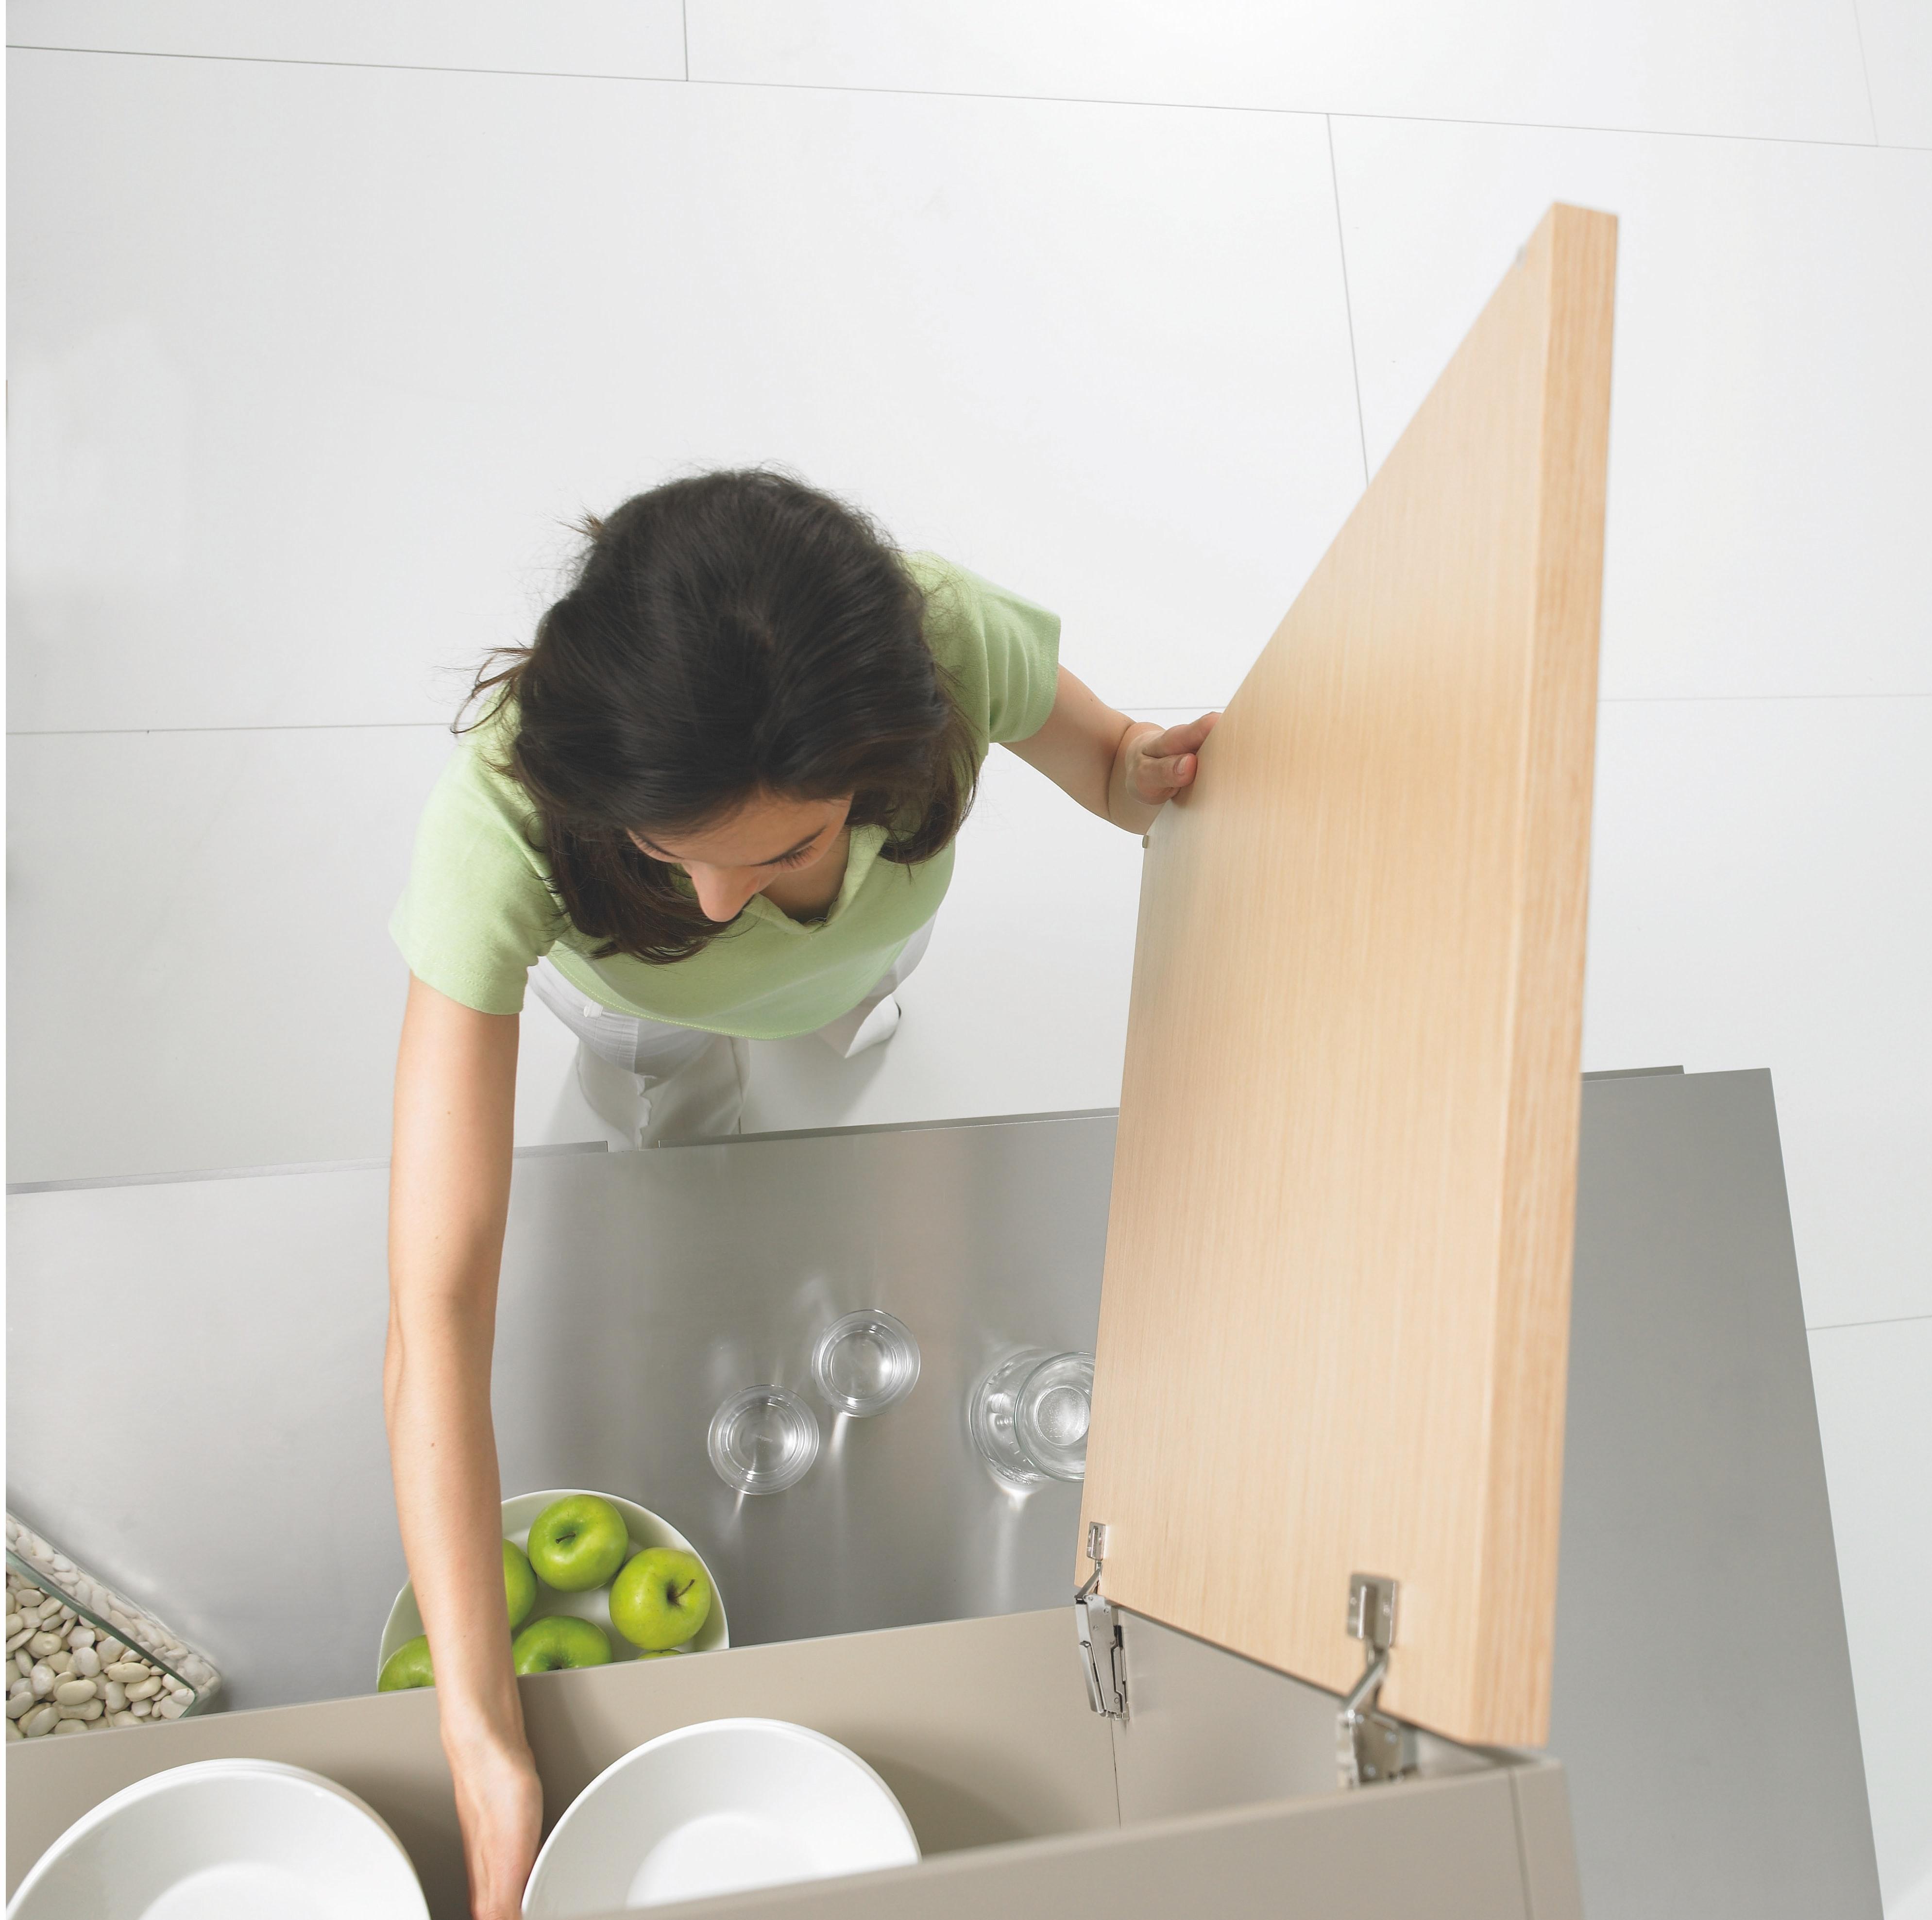 organisation clean declutter kitchen clean tidy plates localbini biniblog lifestyle tips